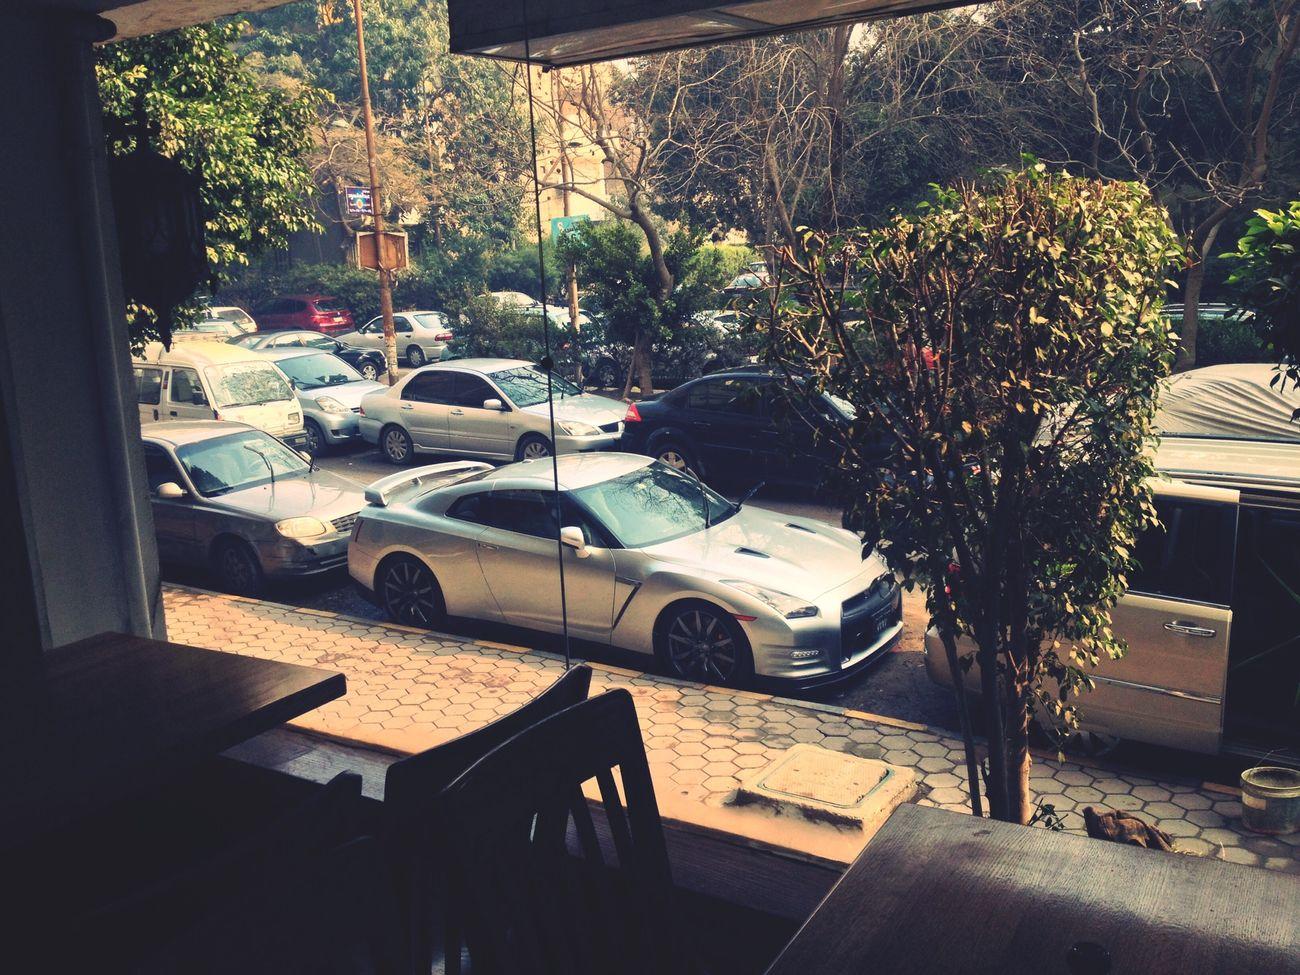 Exotic Cars Exotic Nissan Nissan GTR GTR Morning Enjoying Life